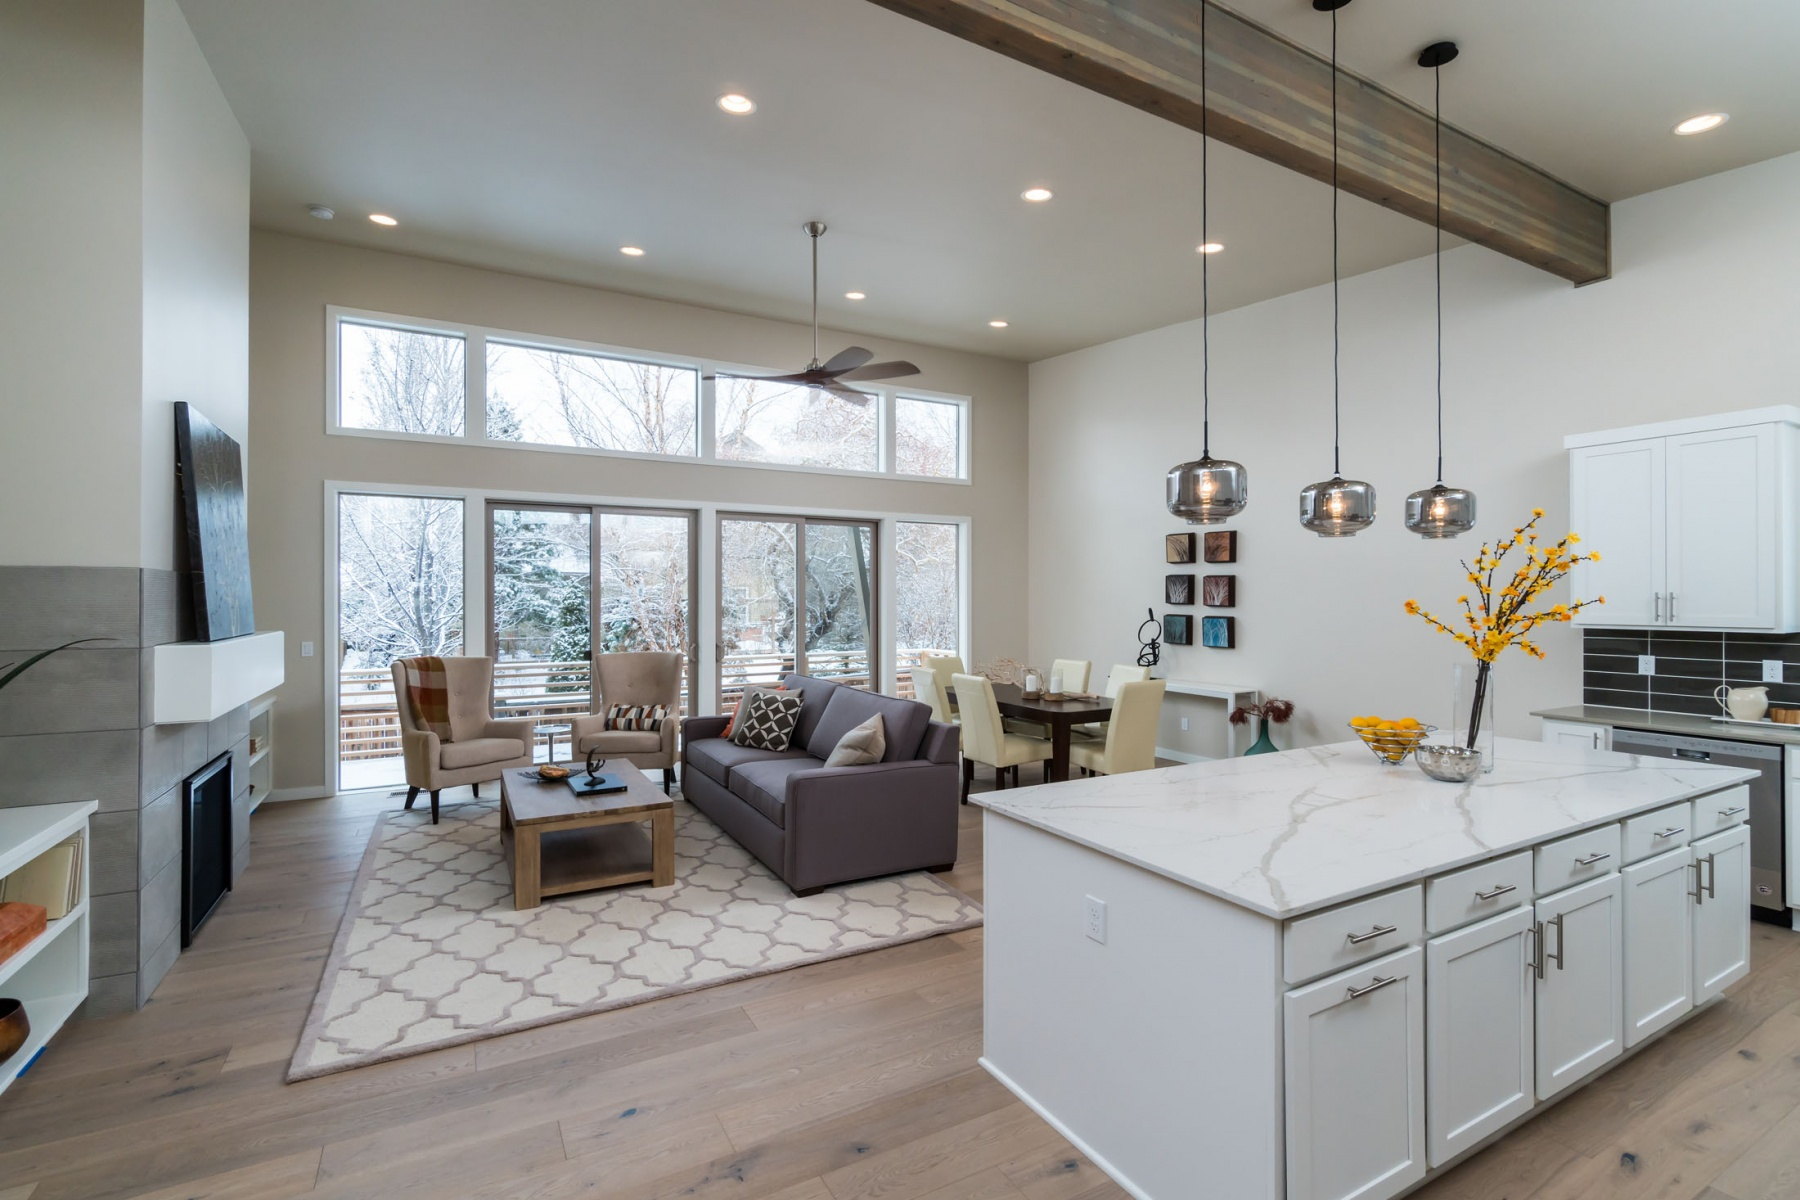 独户住宅 为 销售 在 Modern Single Level in Skystone 63153 Iner Loop 本德, 俄勒冈州, 97701 美国